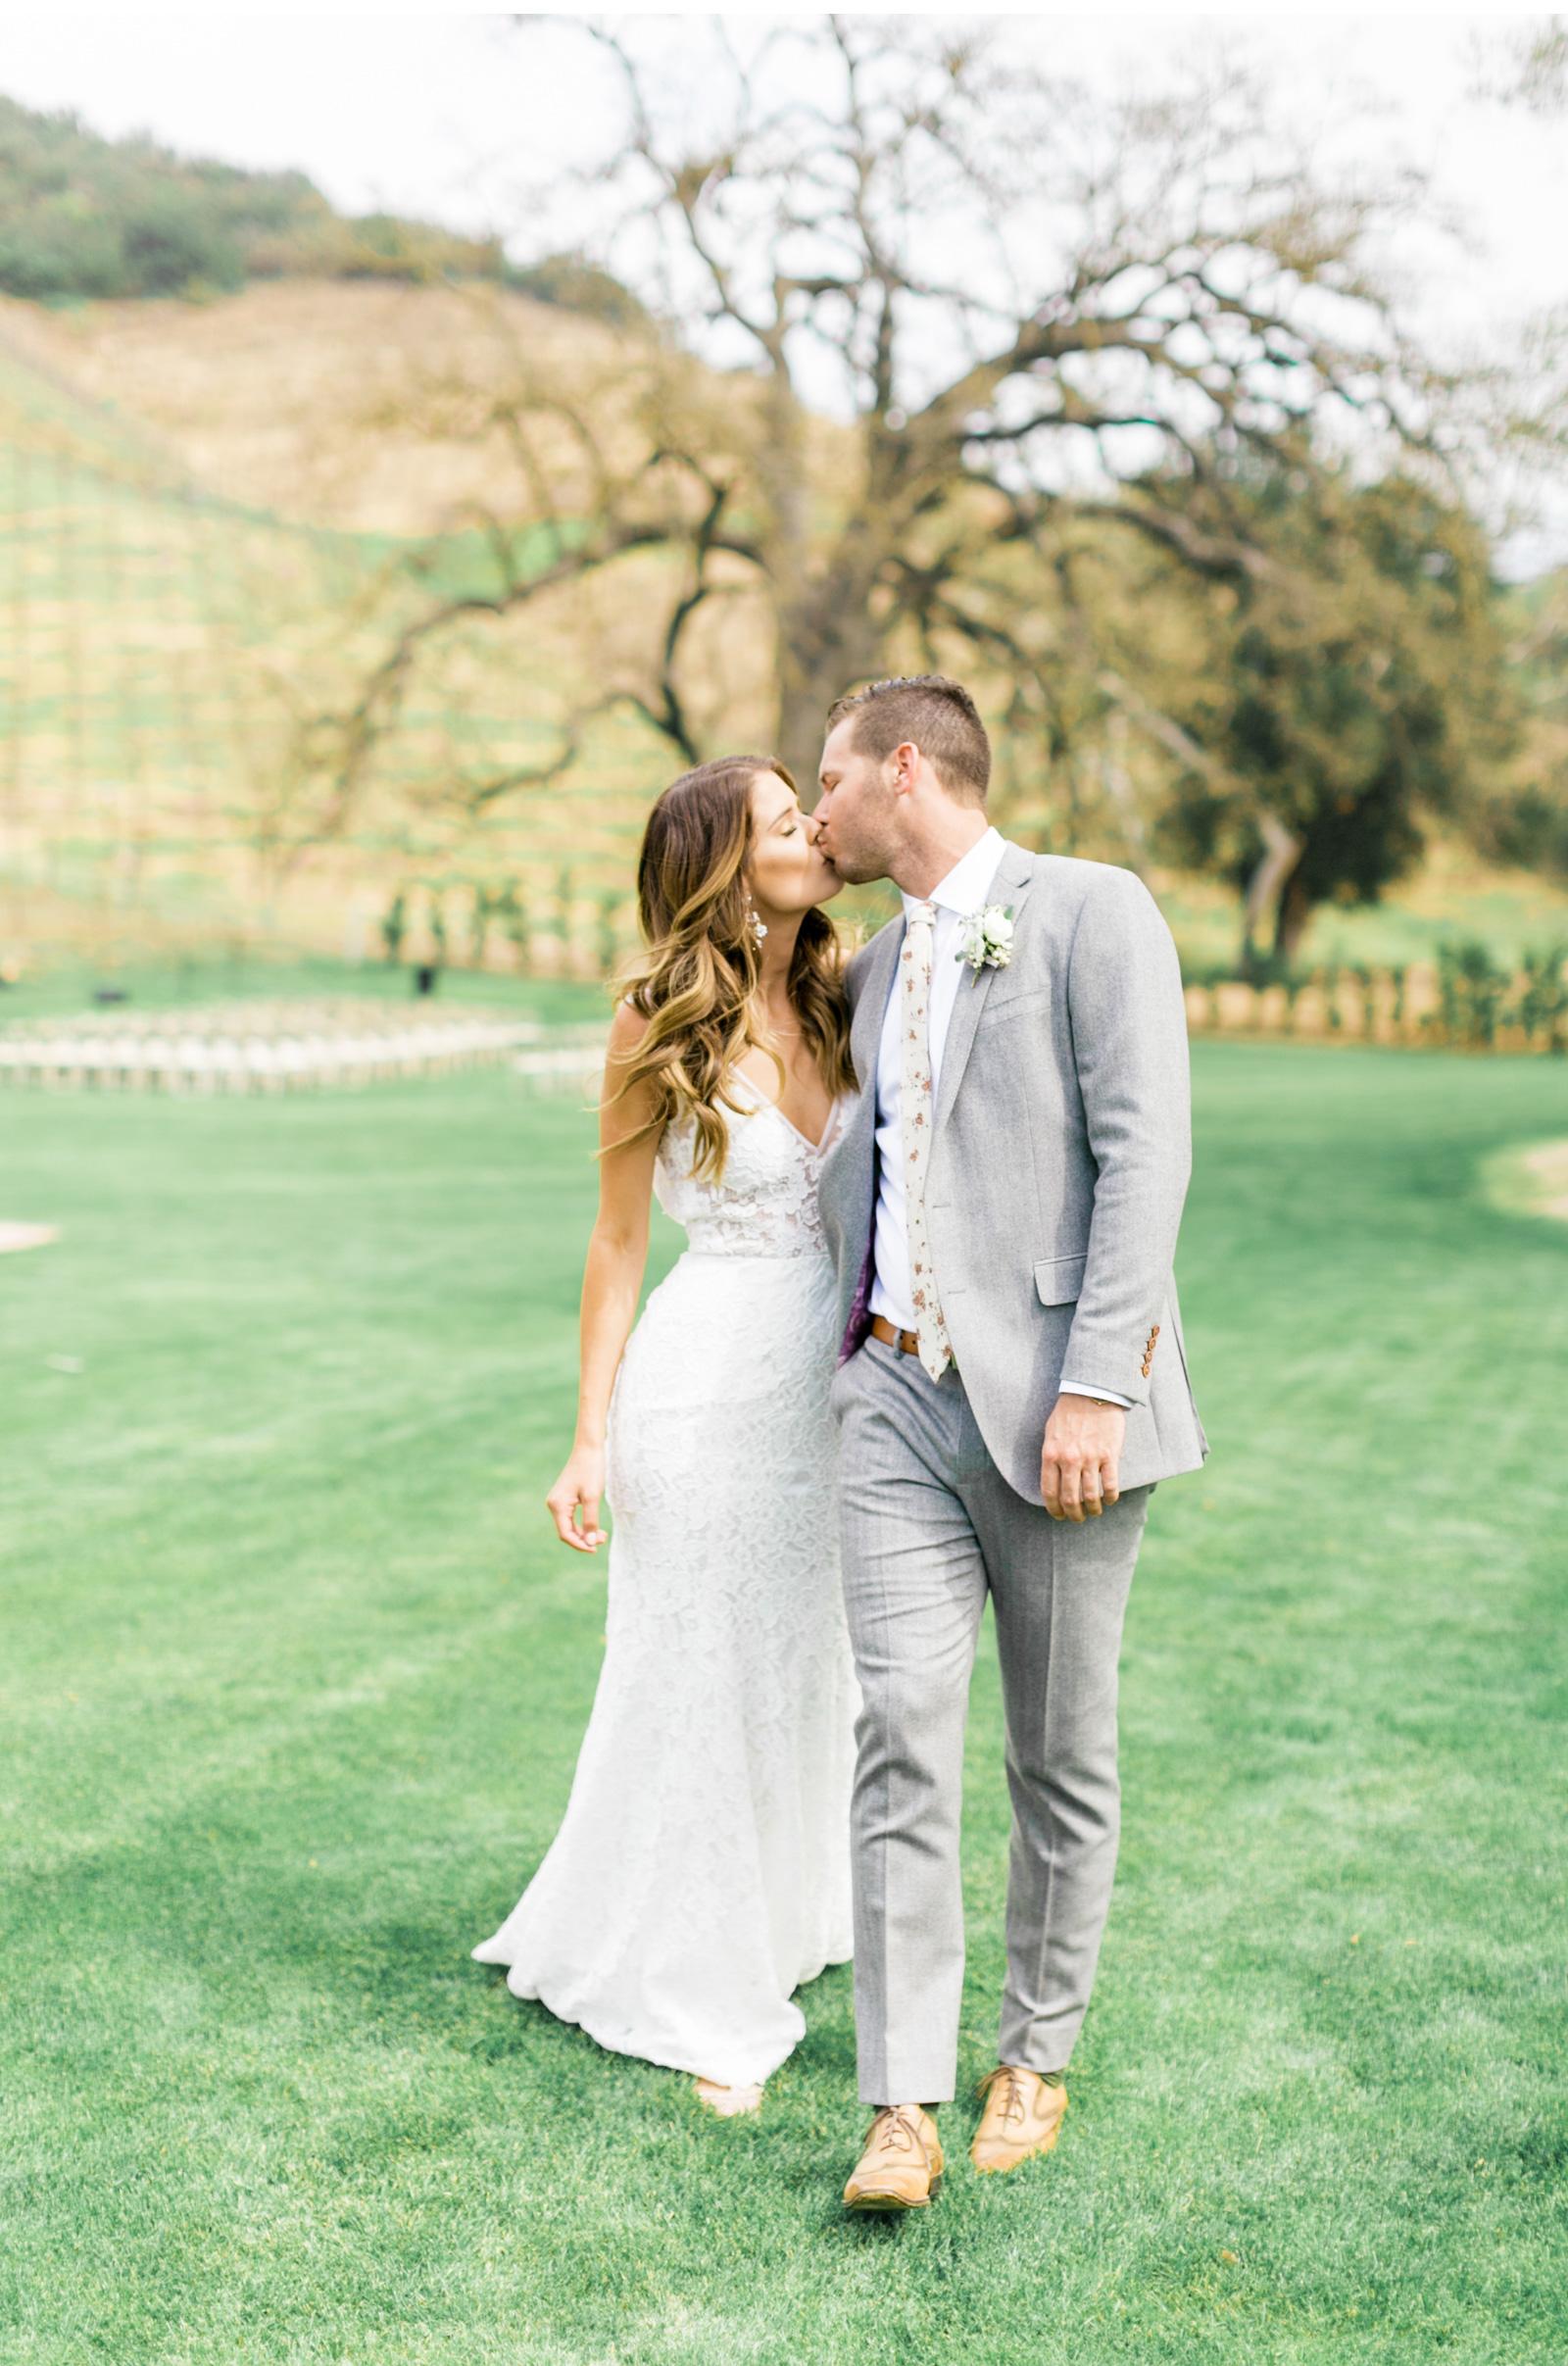 Triunfo-Creek-Saddlerock-Ranch-Wedding-Photographer-Natalie-Schutt-Photography_04.jpg